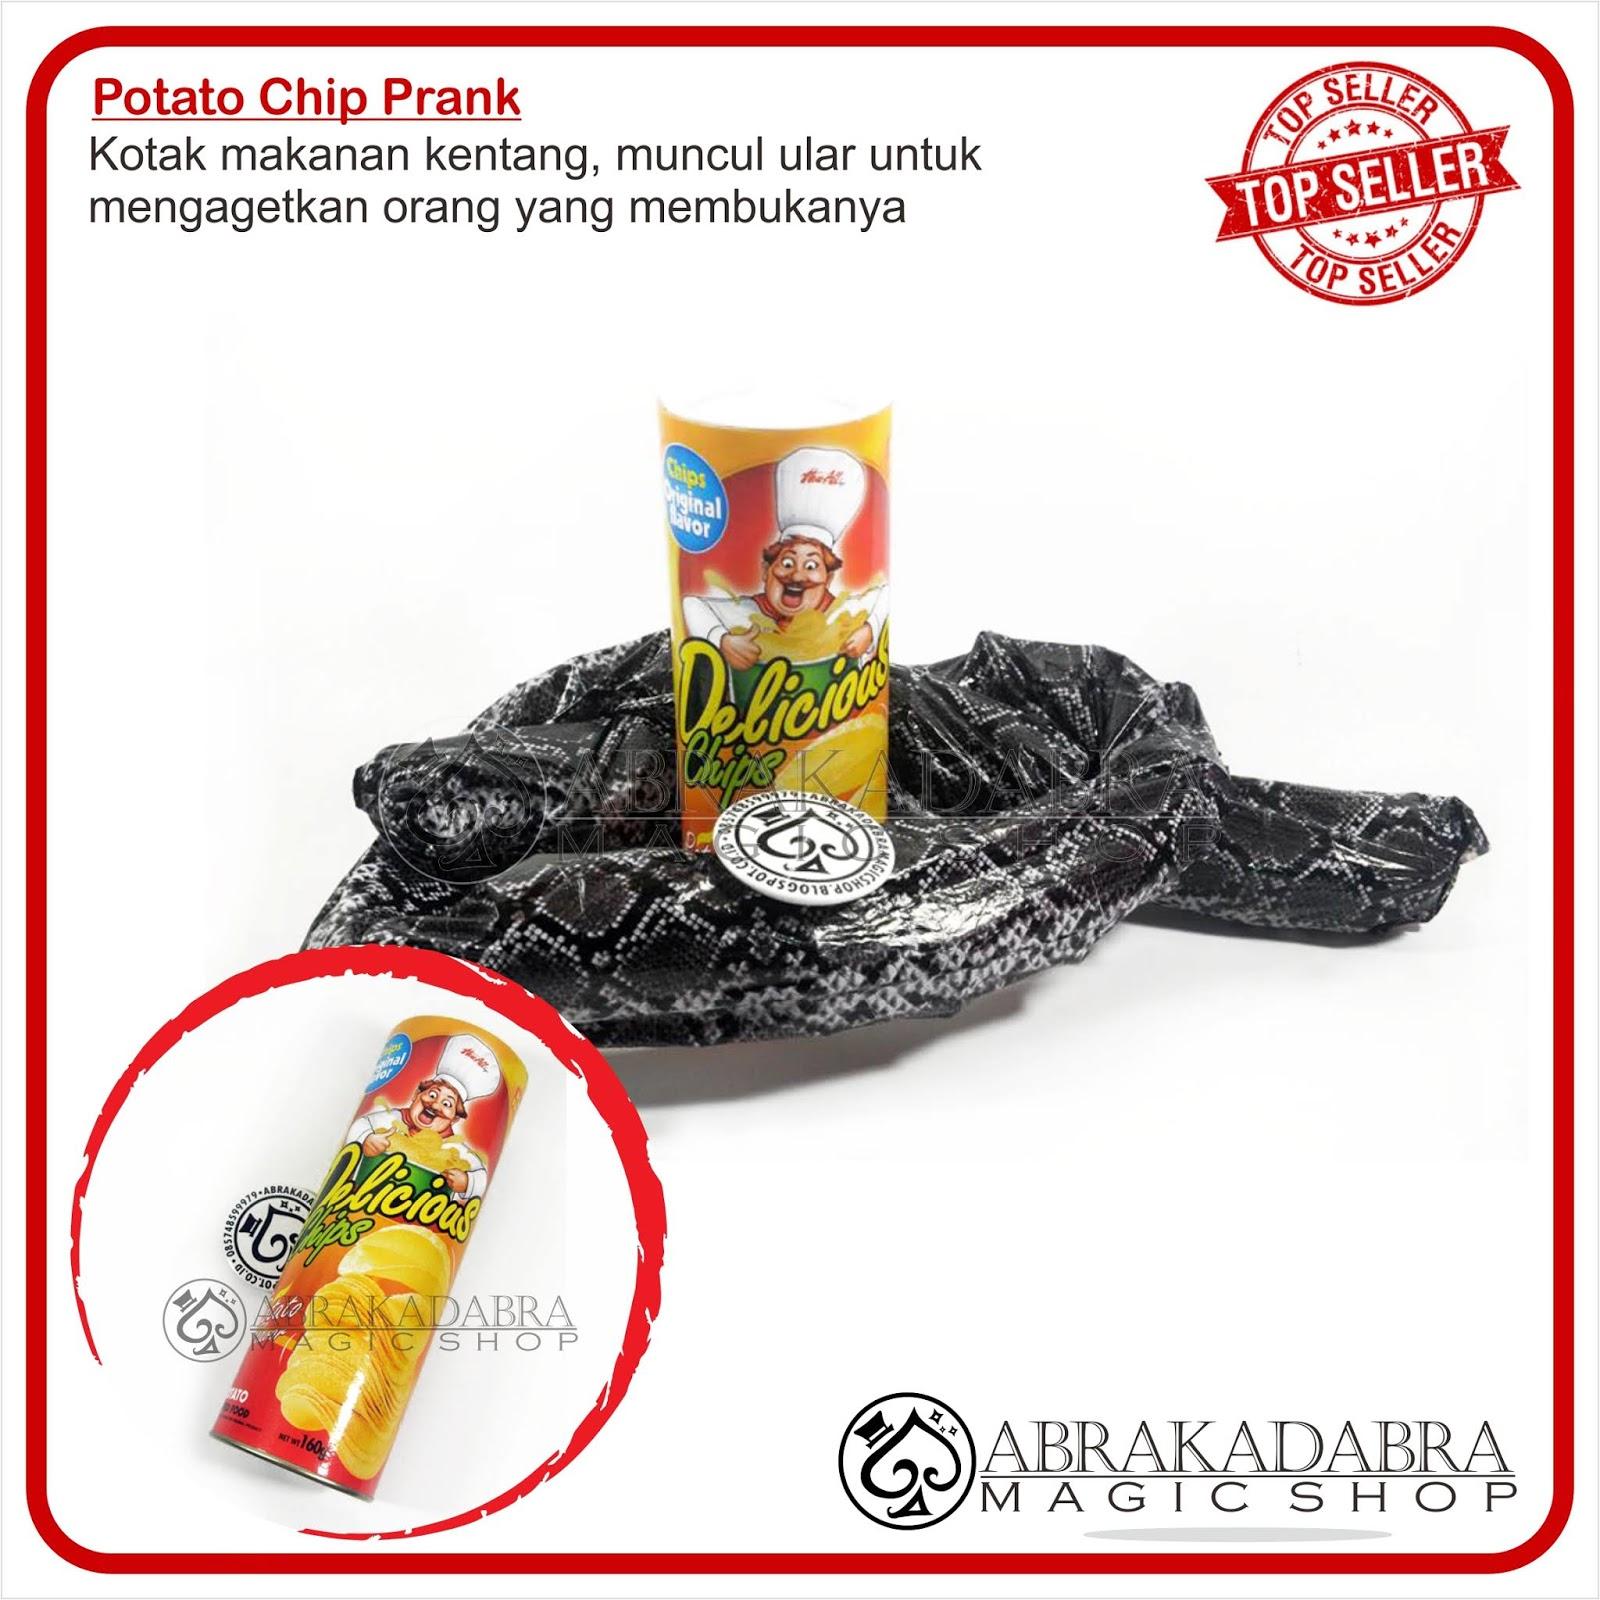 Potato Chip Prank